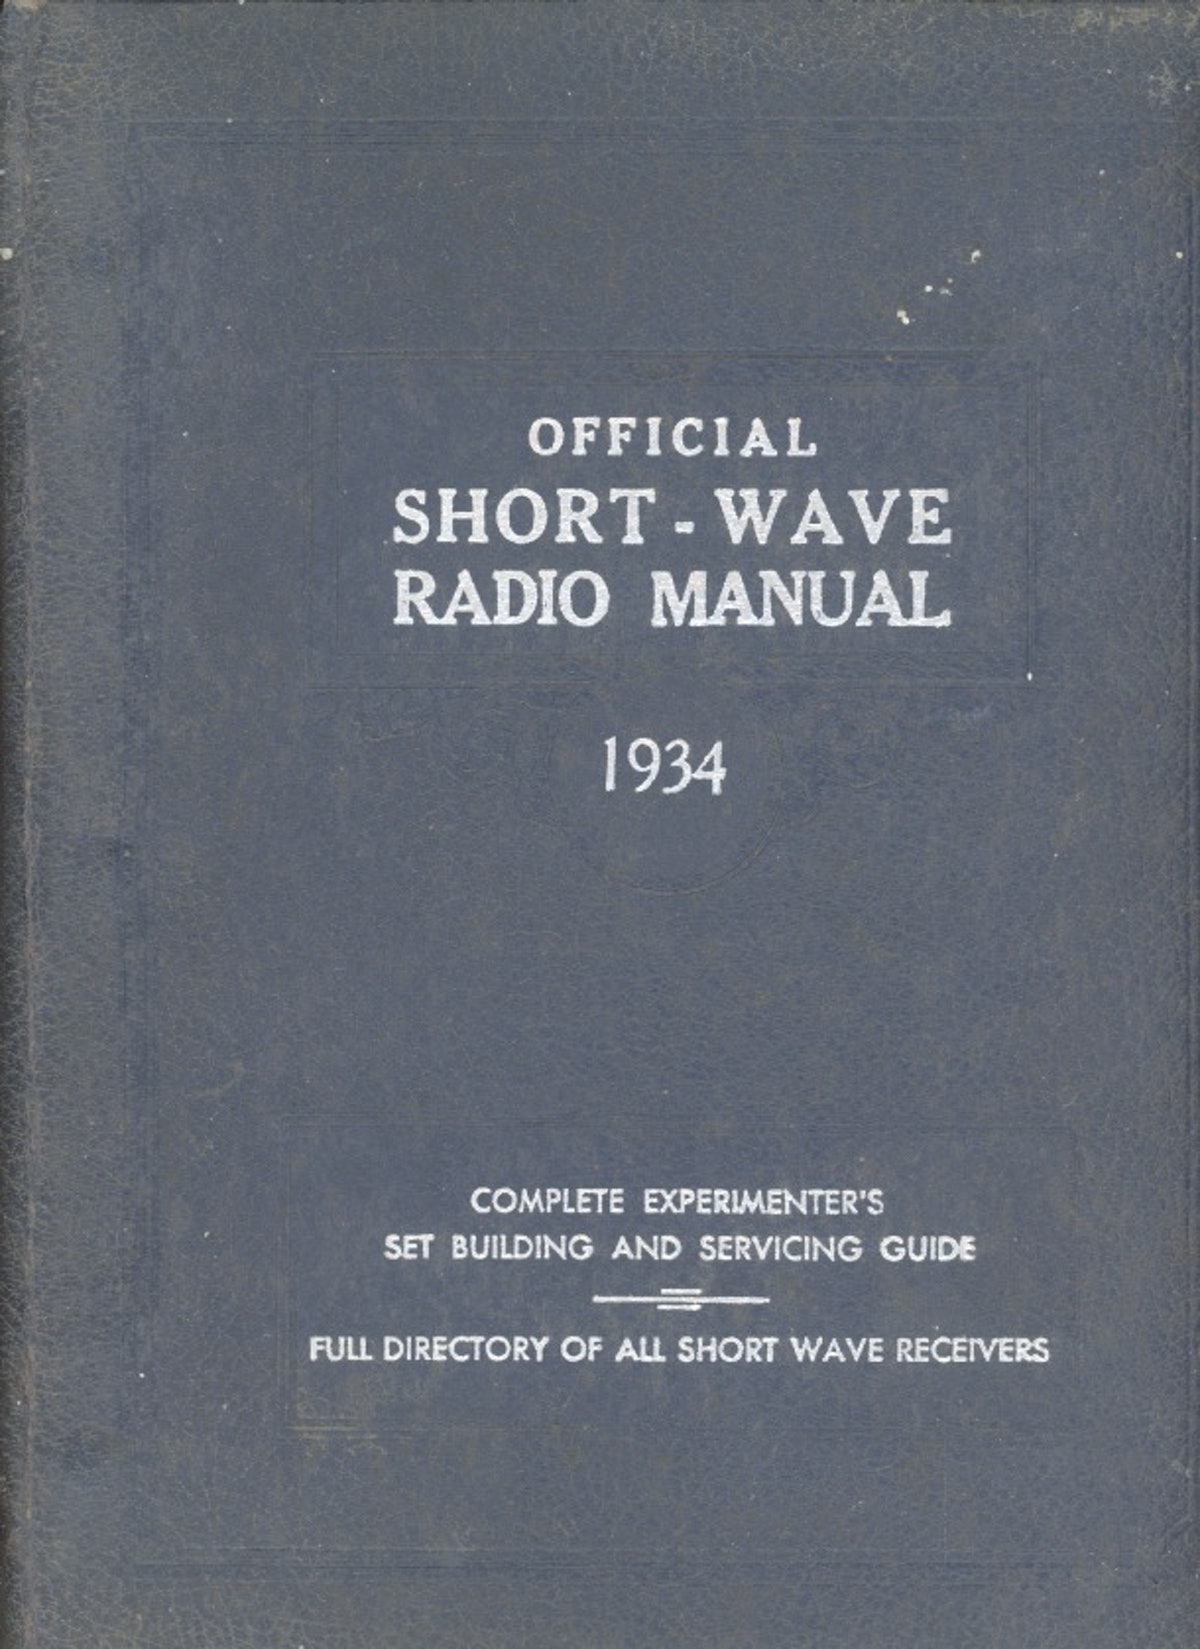 Official Short-Wave Radio Manual 1934